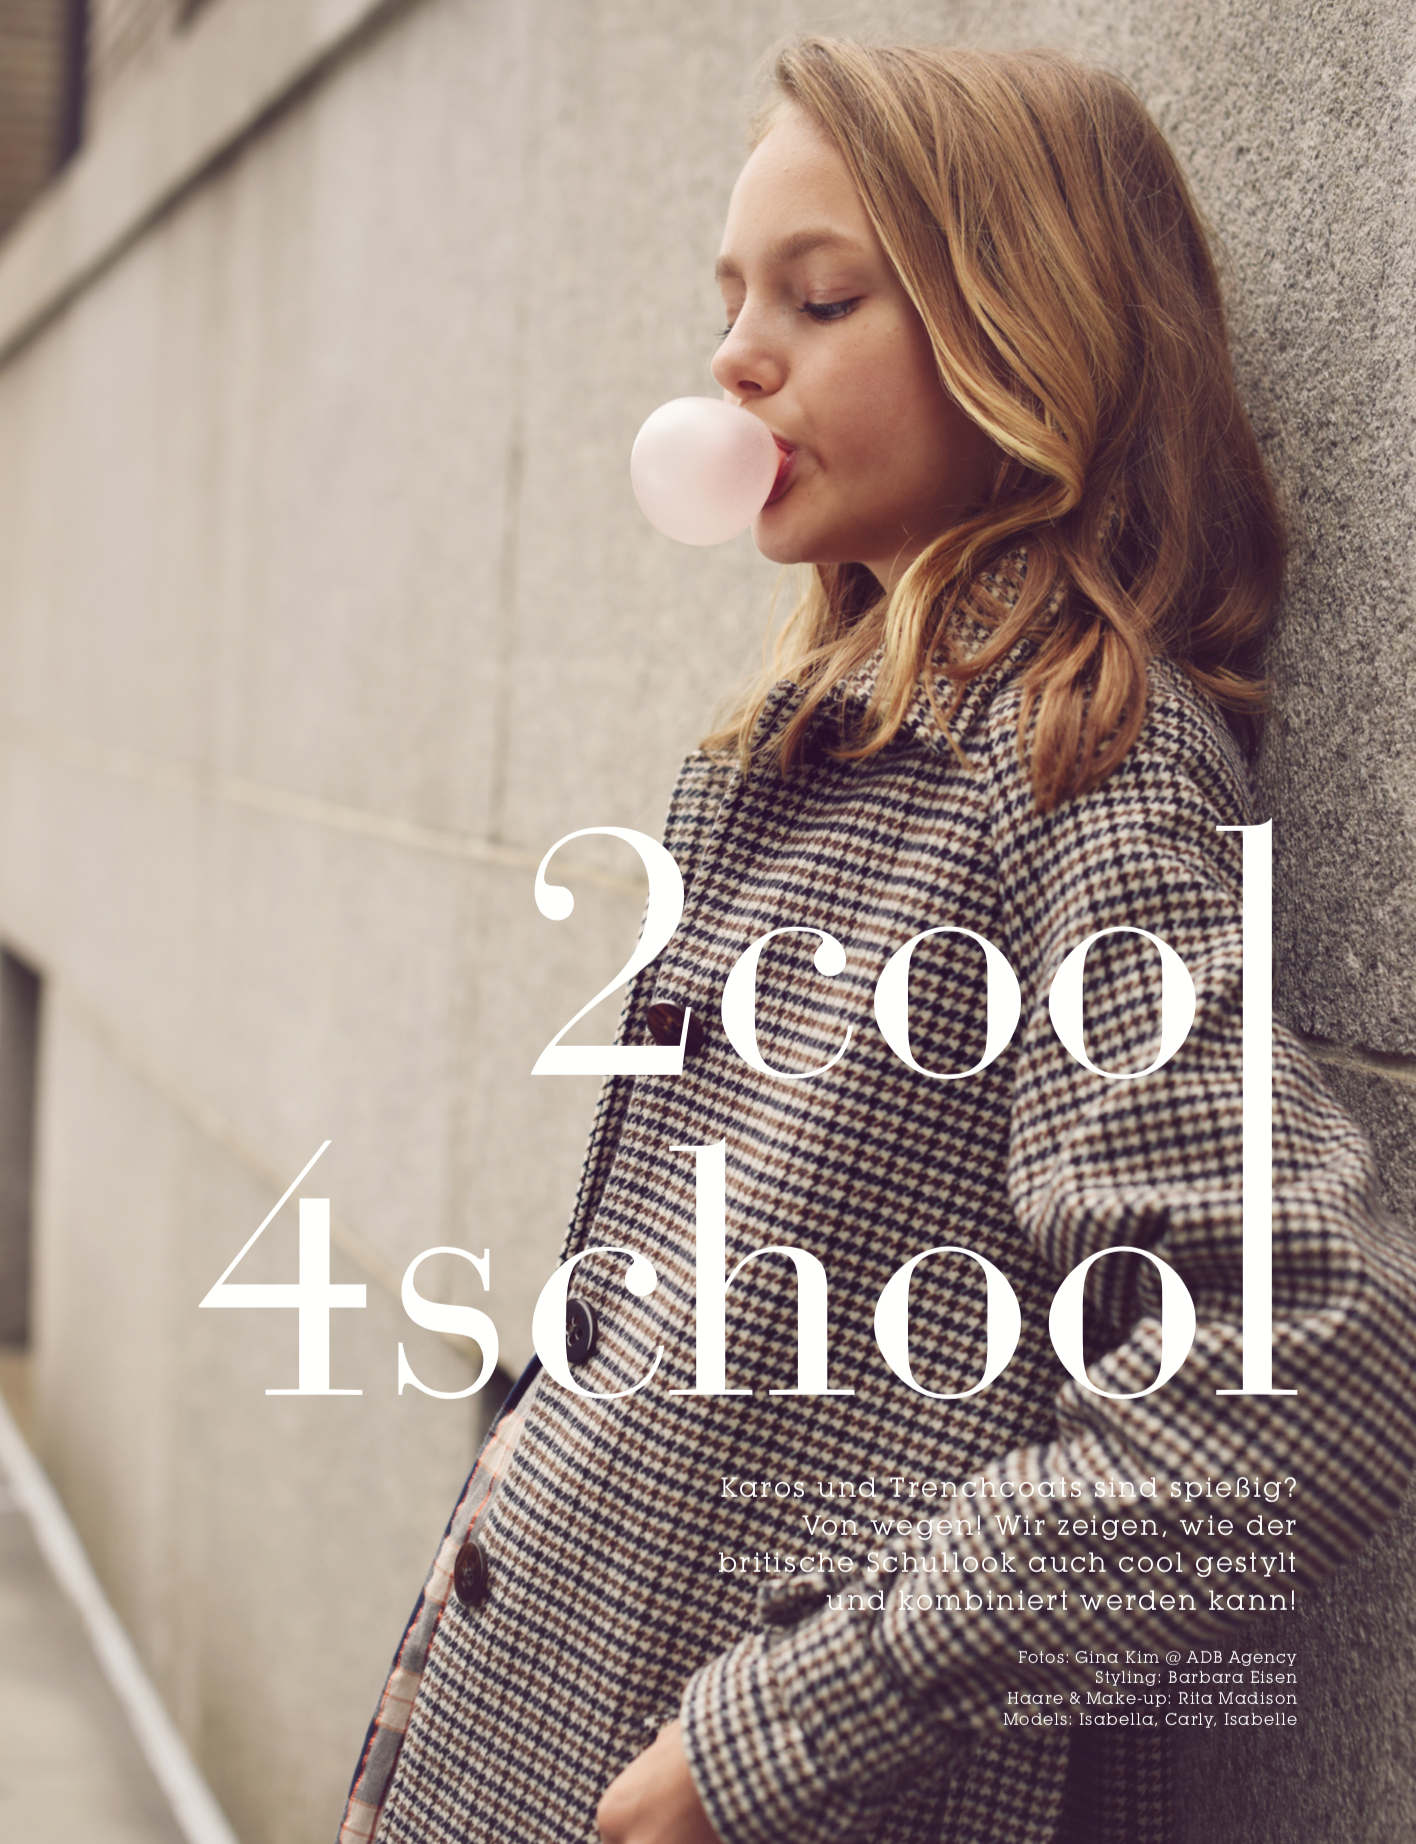 2cool4school_1.png